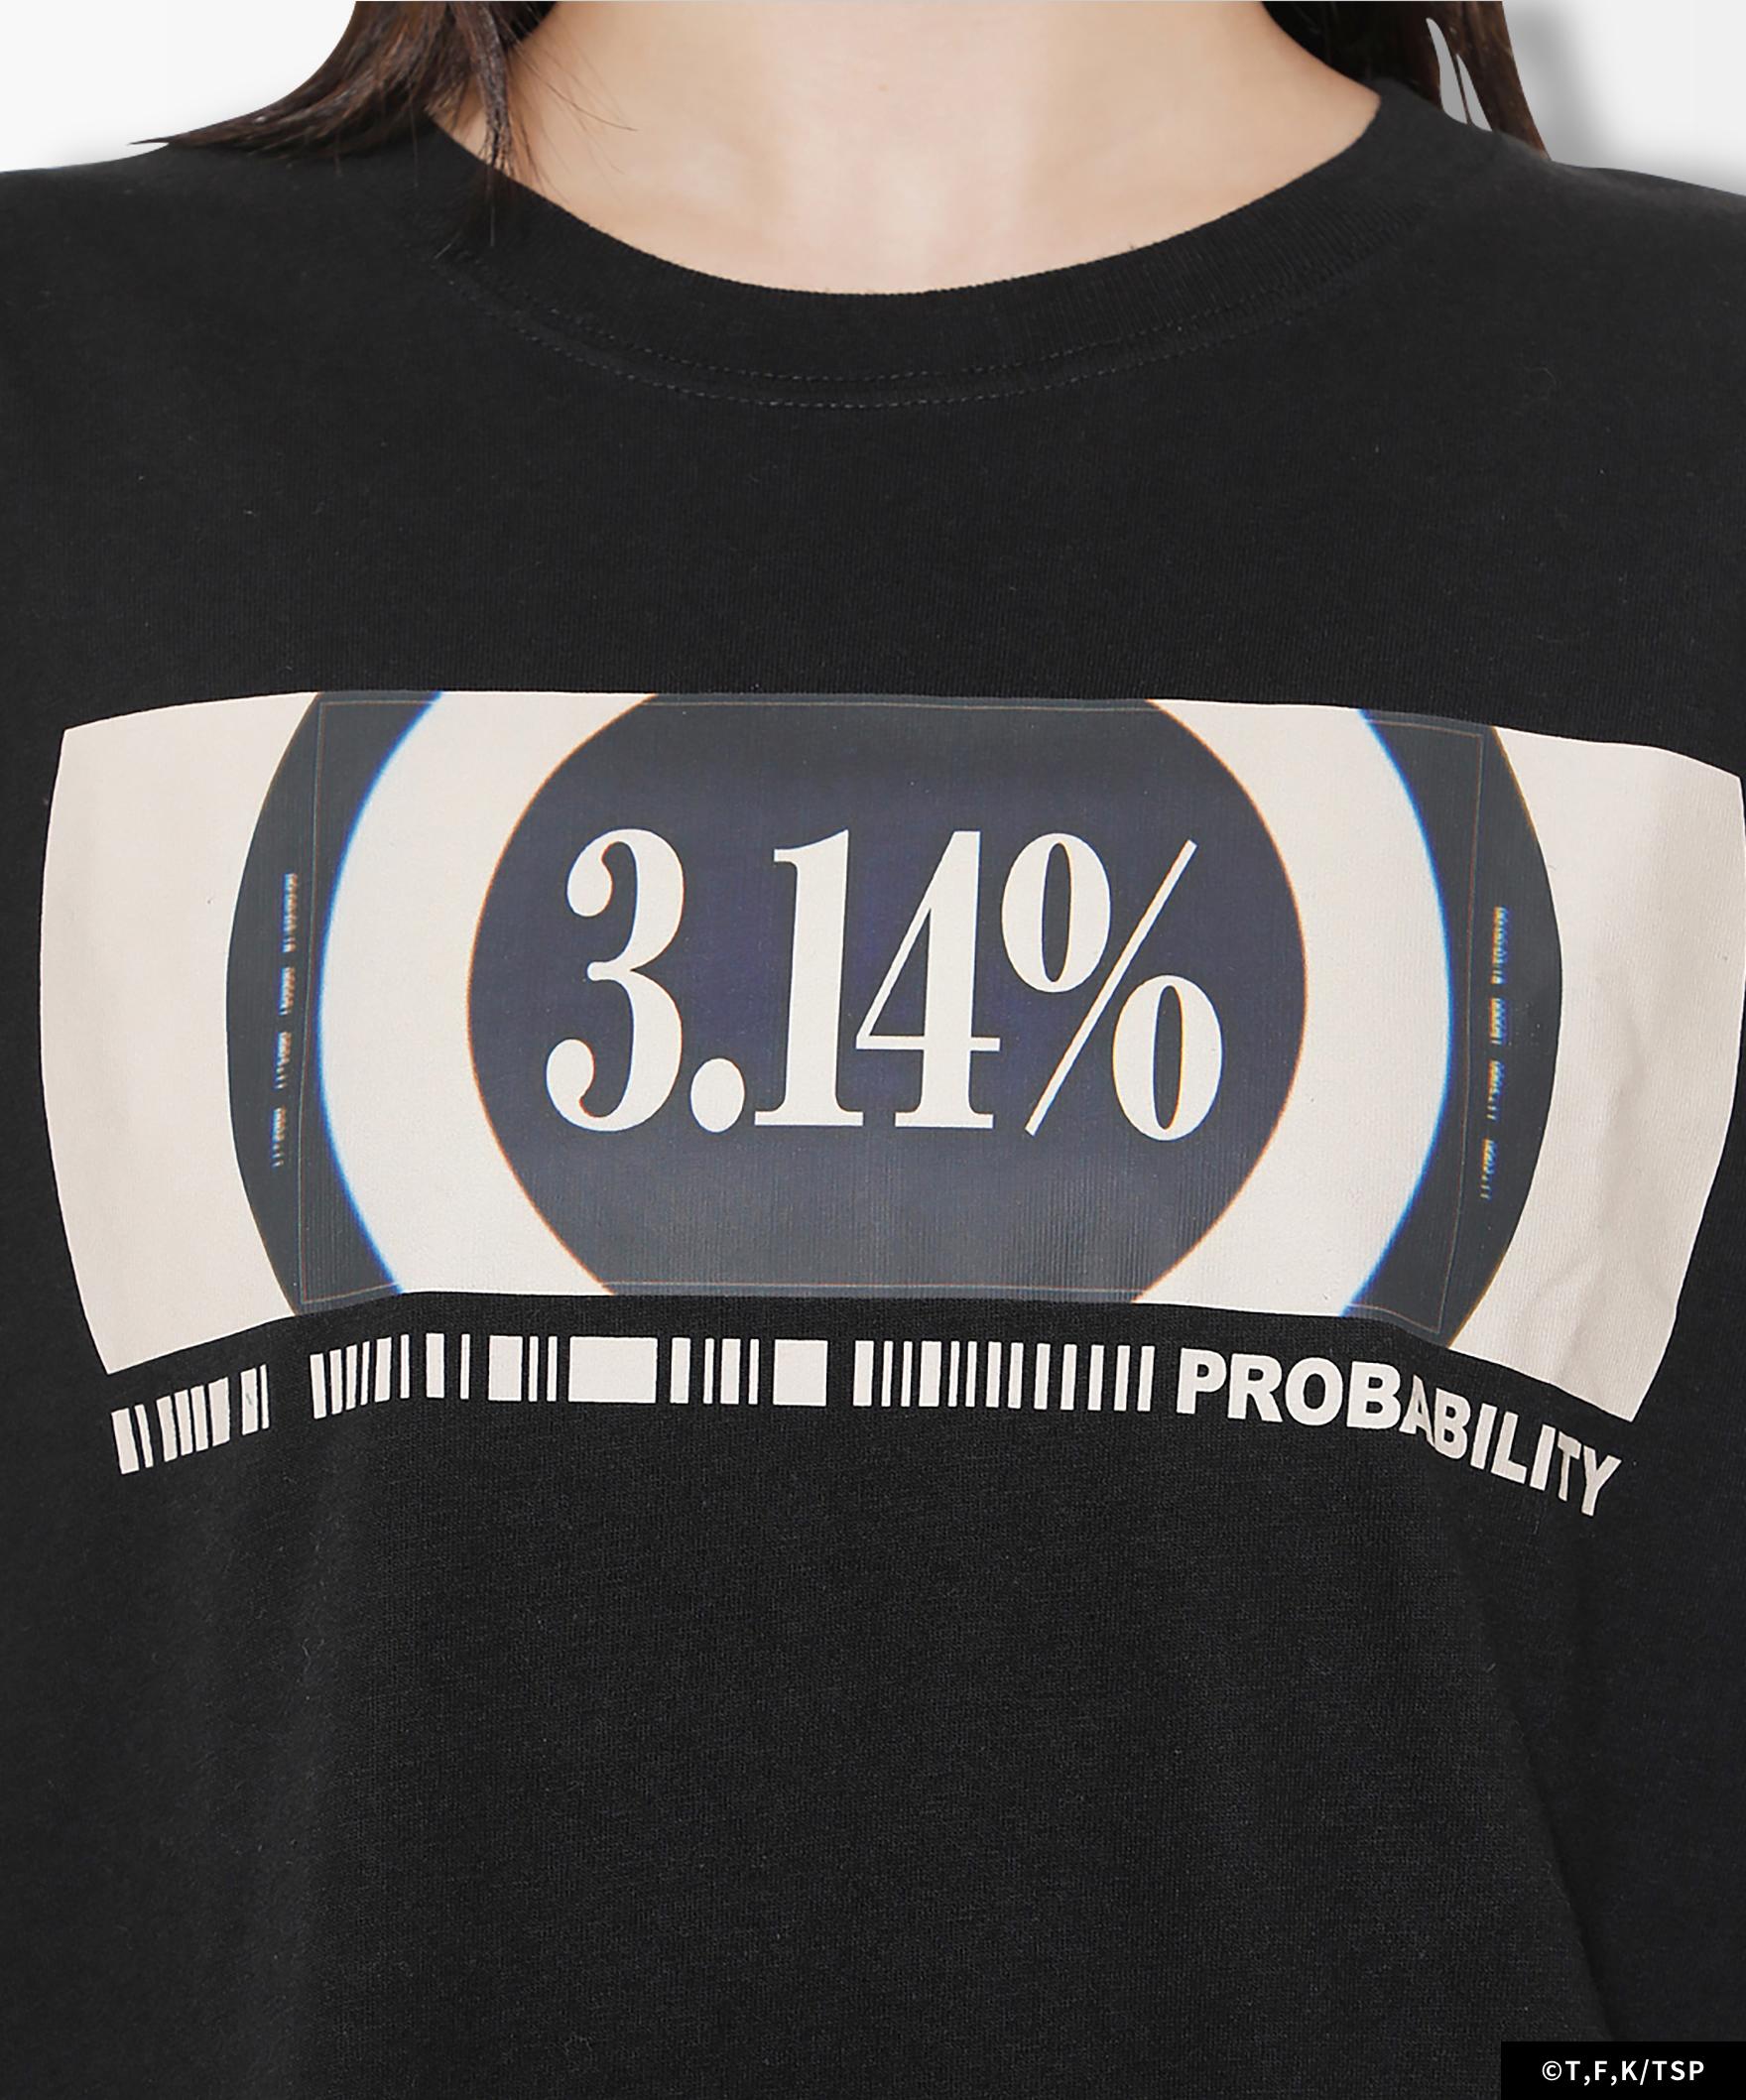 BAMEN L/S TEE PROBABILITY 3.14